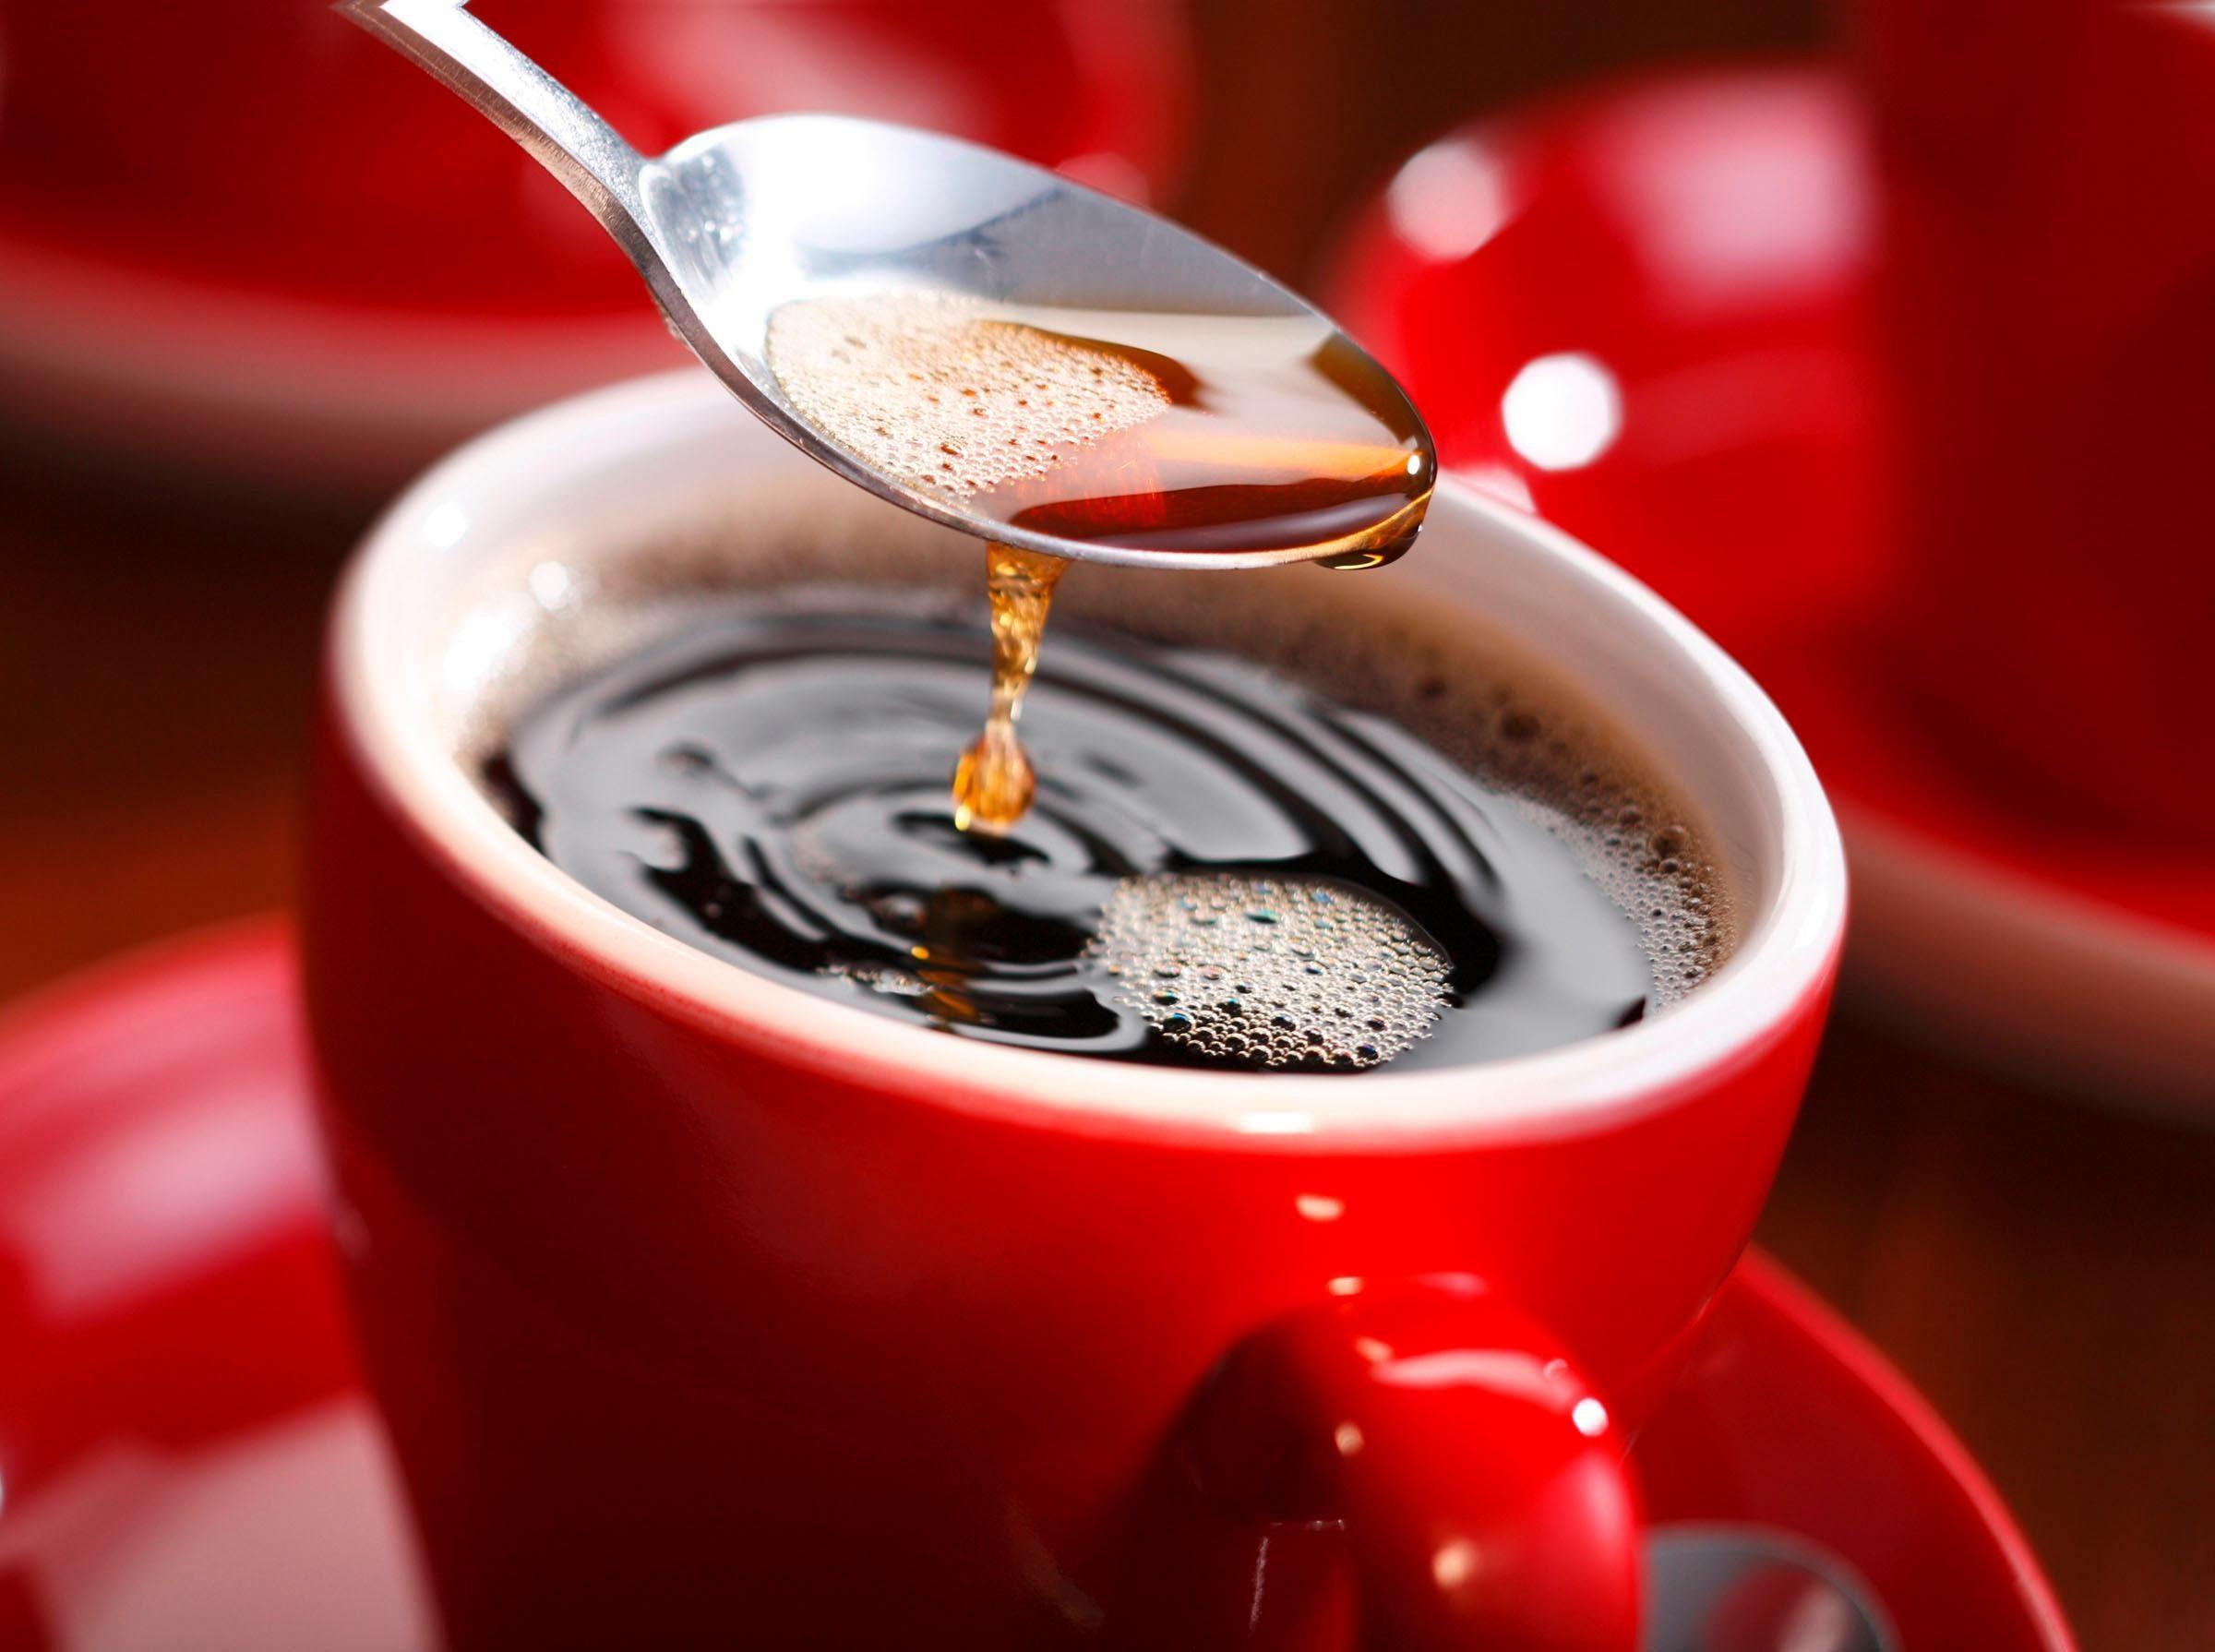 Home affaire Leinwandbild »Tasse Kaffee«, Tasse, 30/40 cm